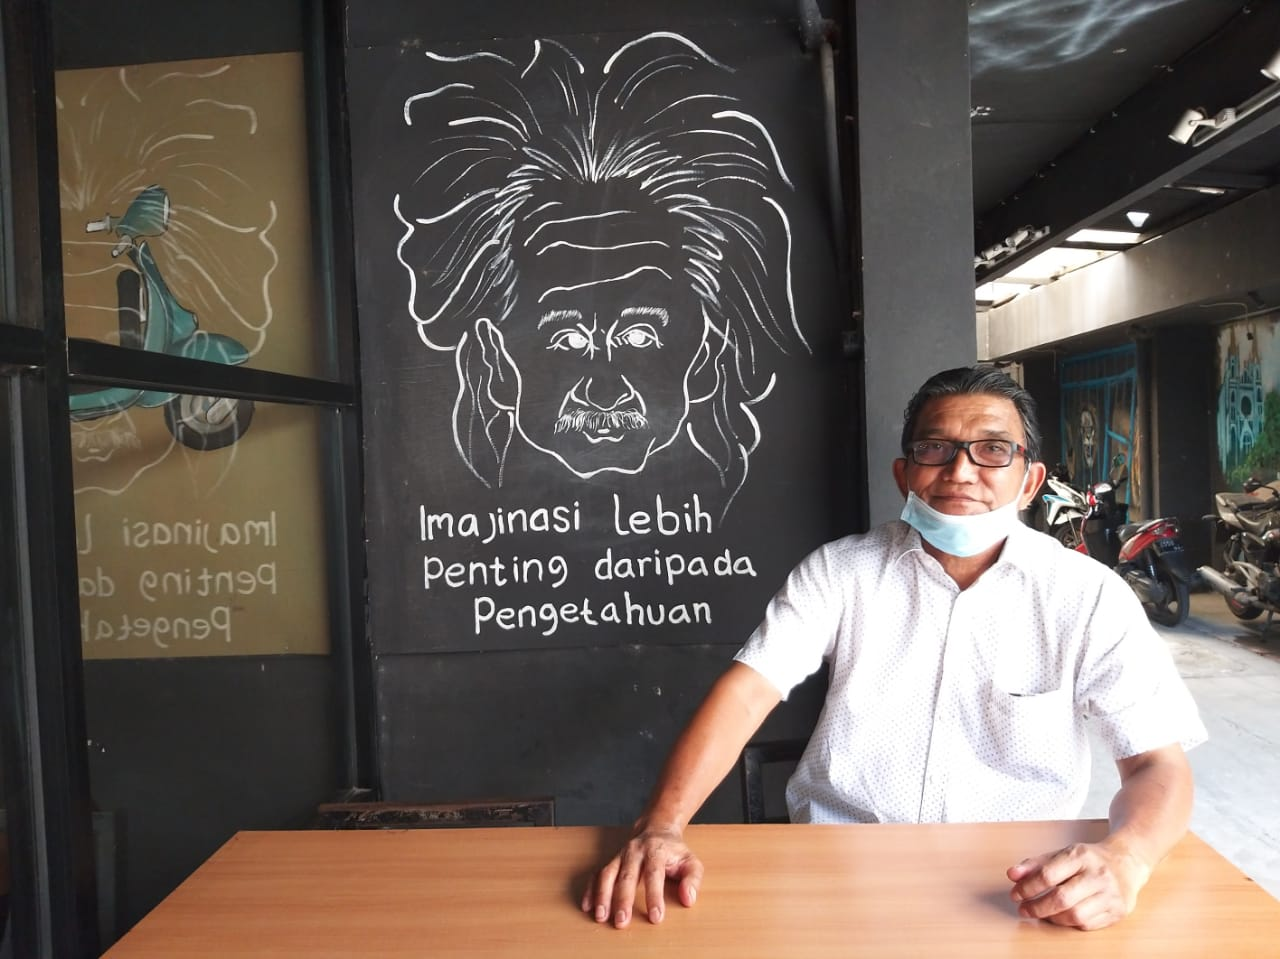 Arief Poyuono Gencar Serang Anies, Amarta: Dia Sedang Cari tiket Dekati Jokowi Karena Ditendang Gerindra